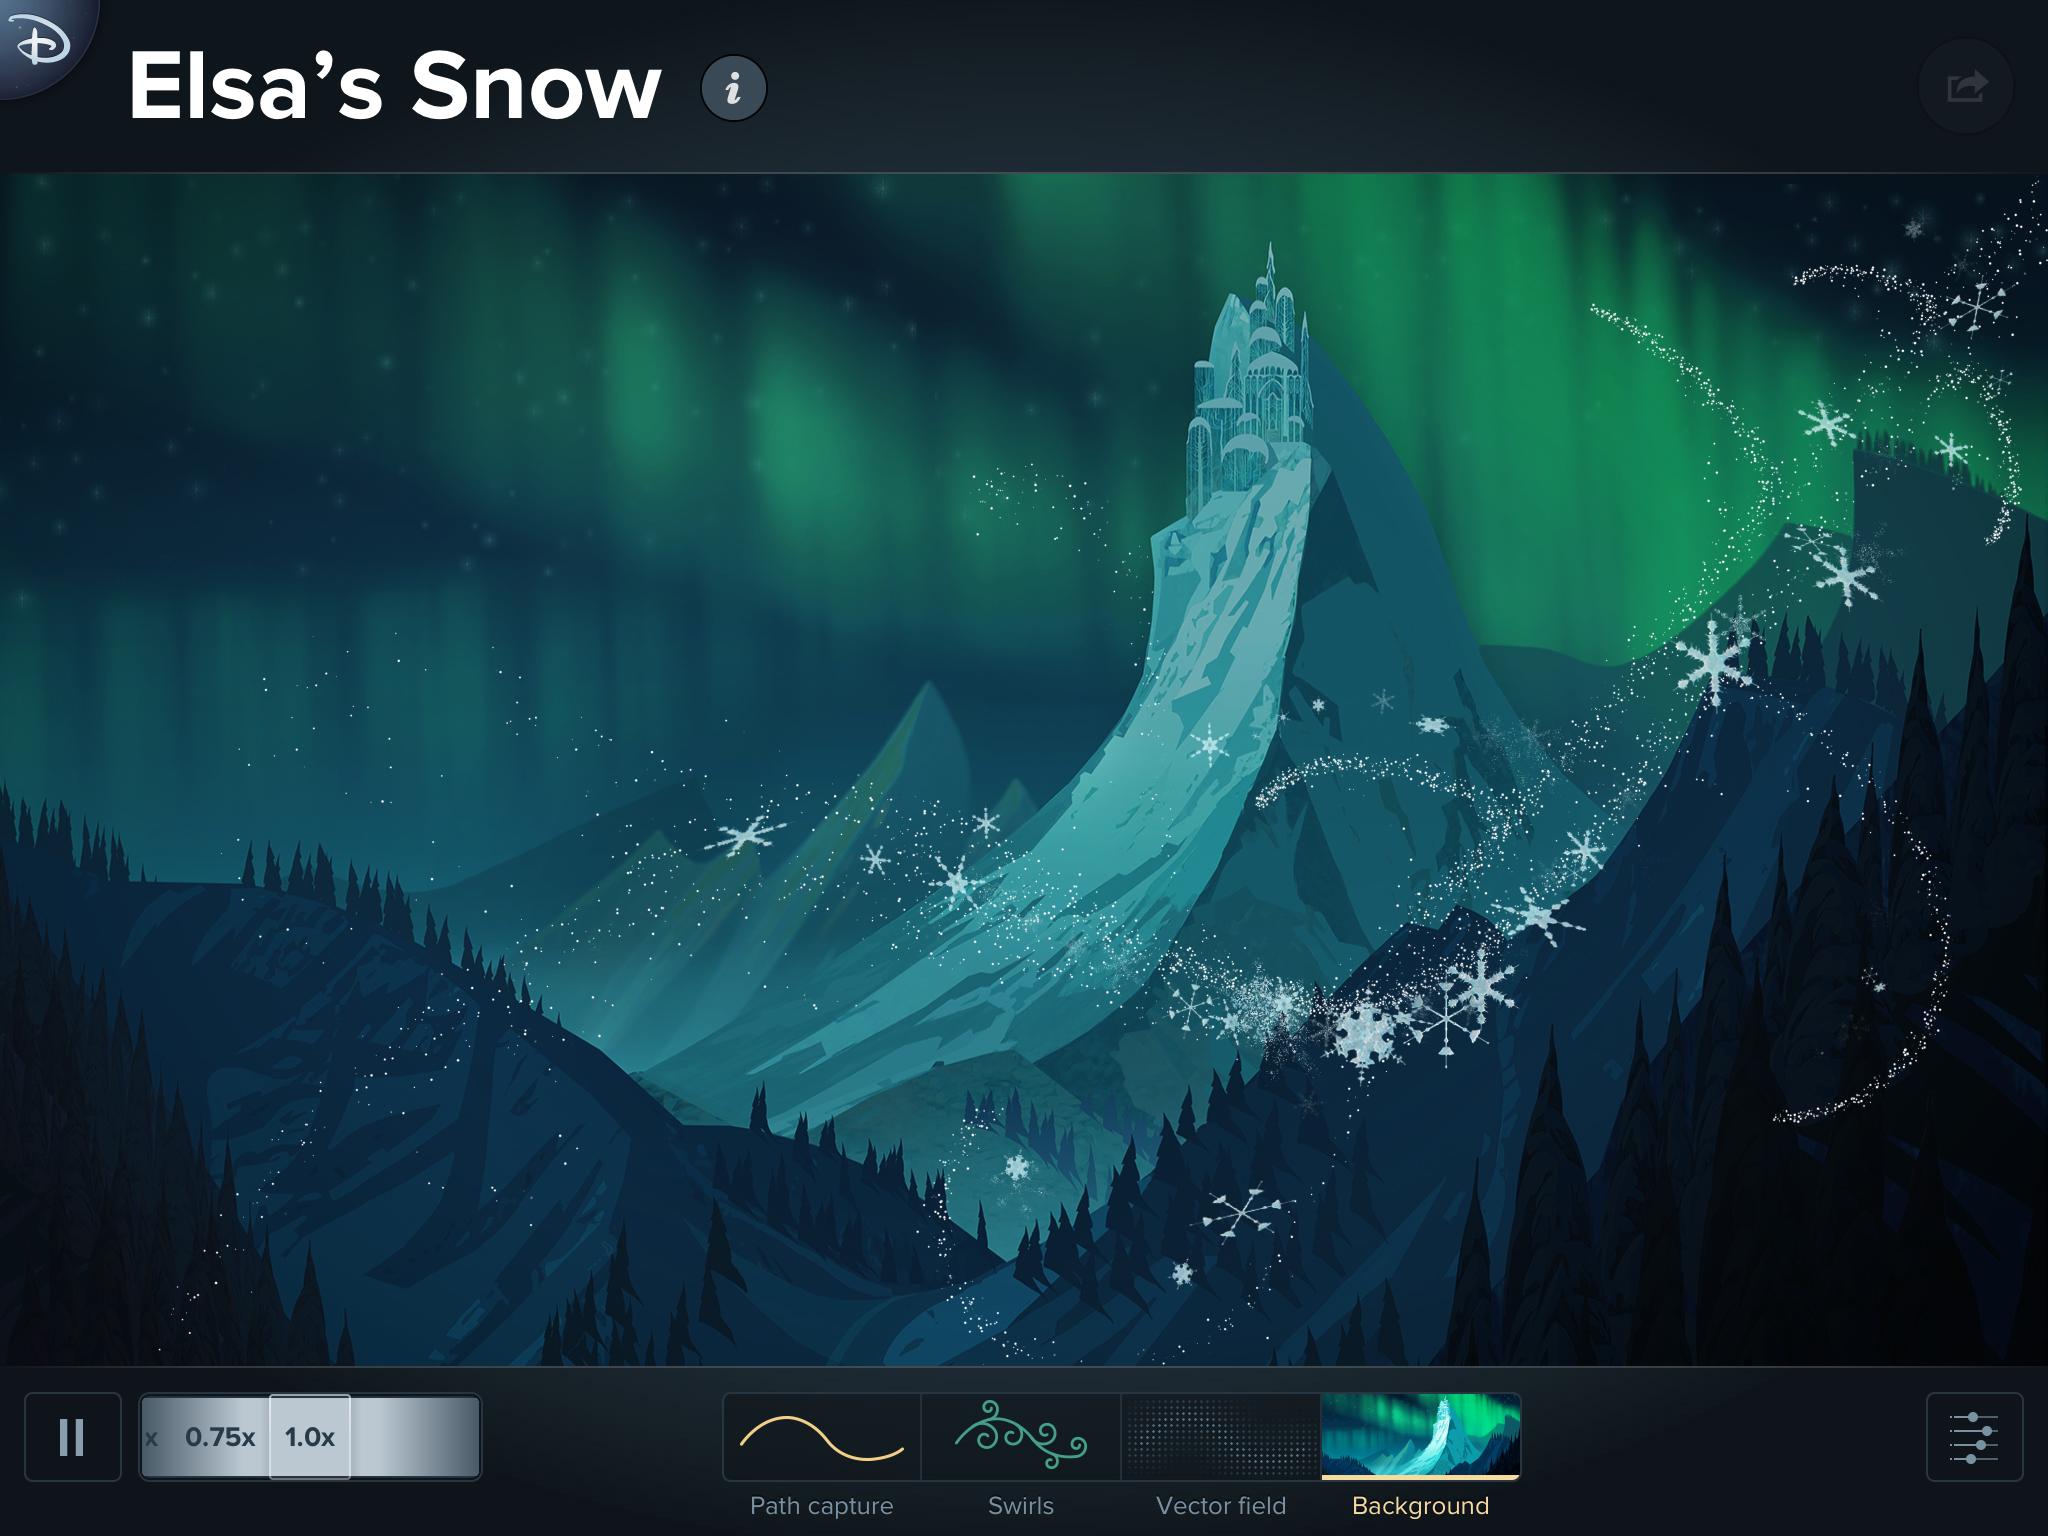 Snow segmented all